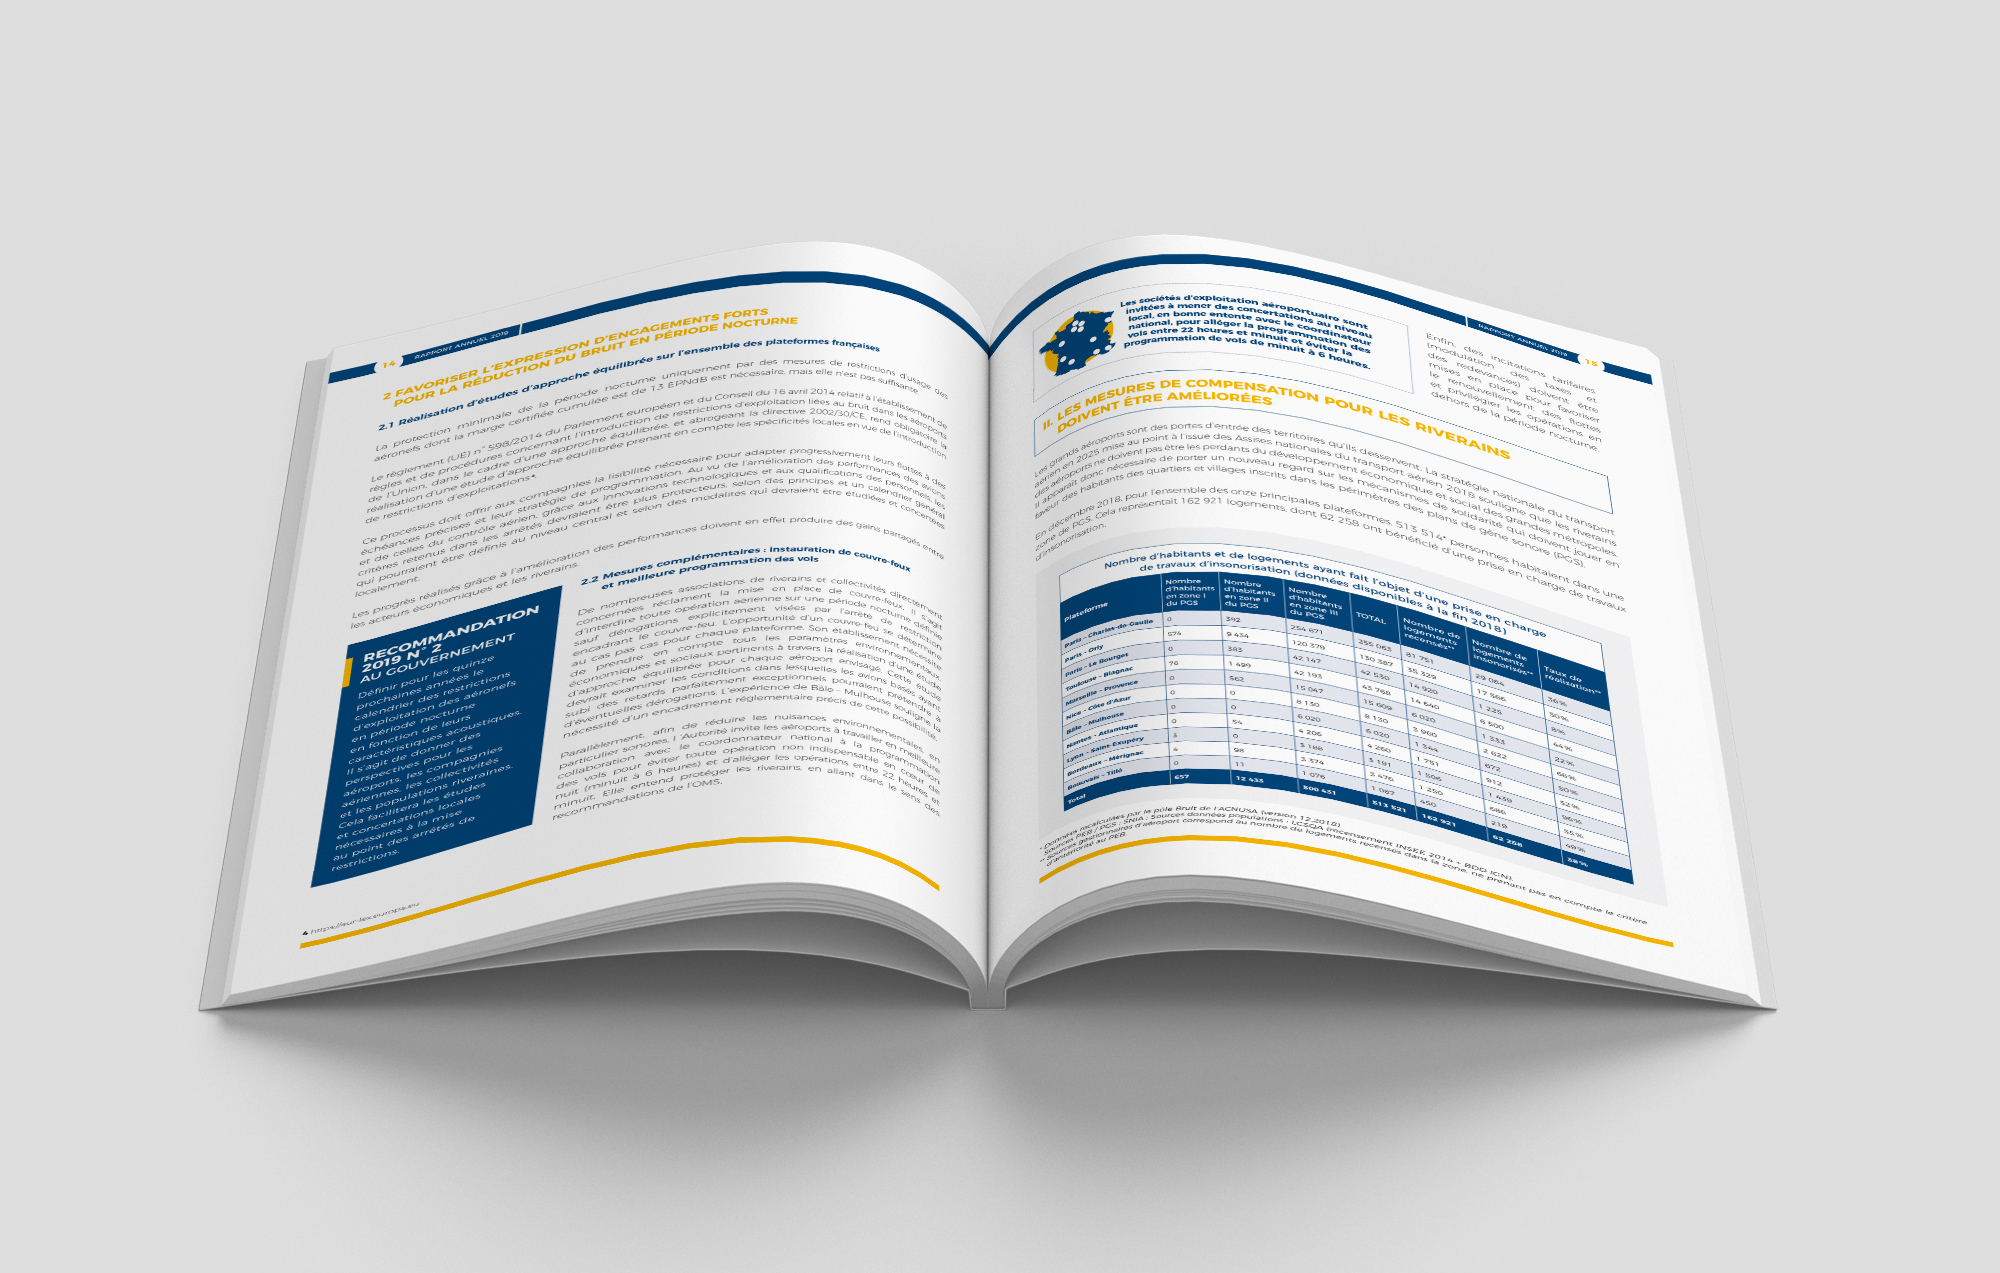 ACNUSA-Rapport-annuel-2019-conception-wala-studio-graphique2